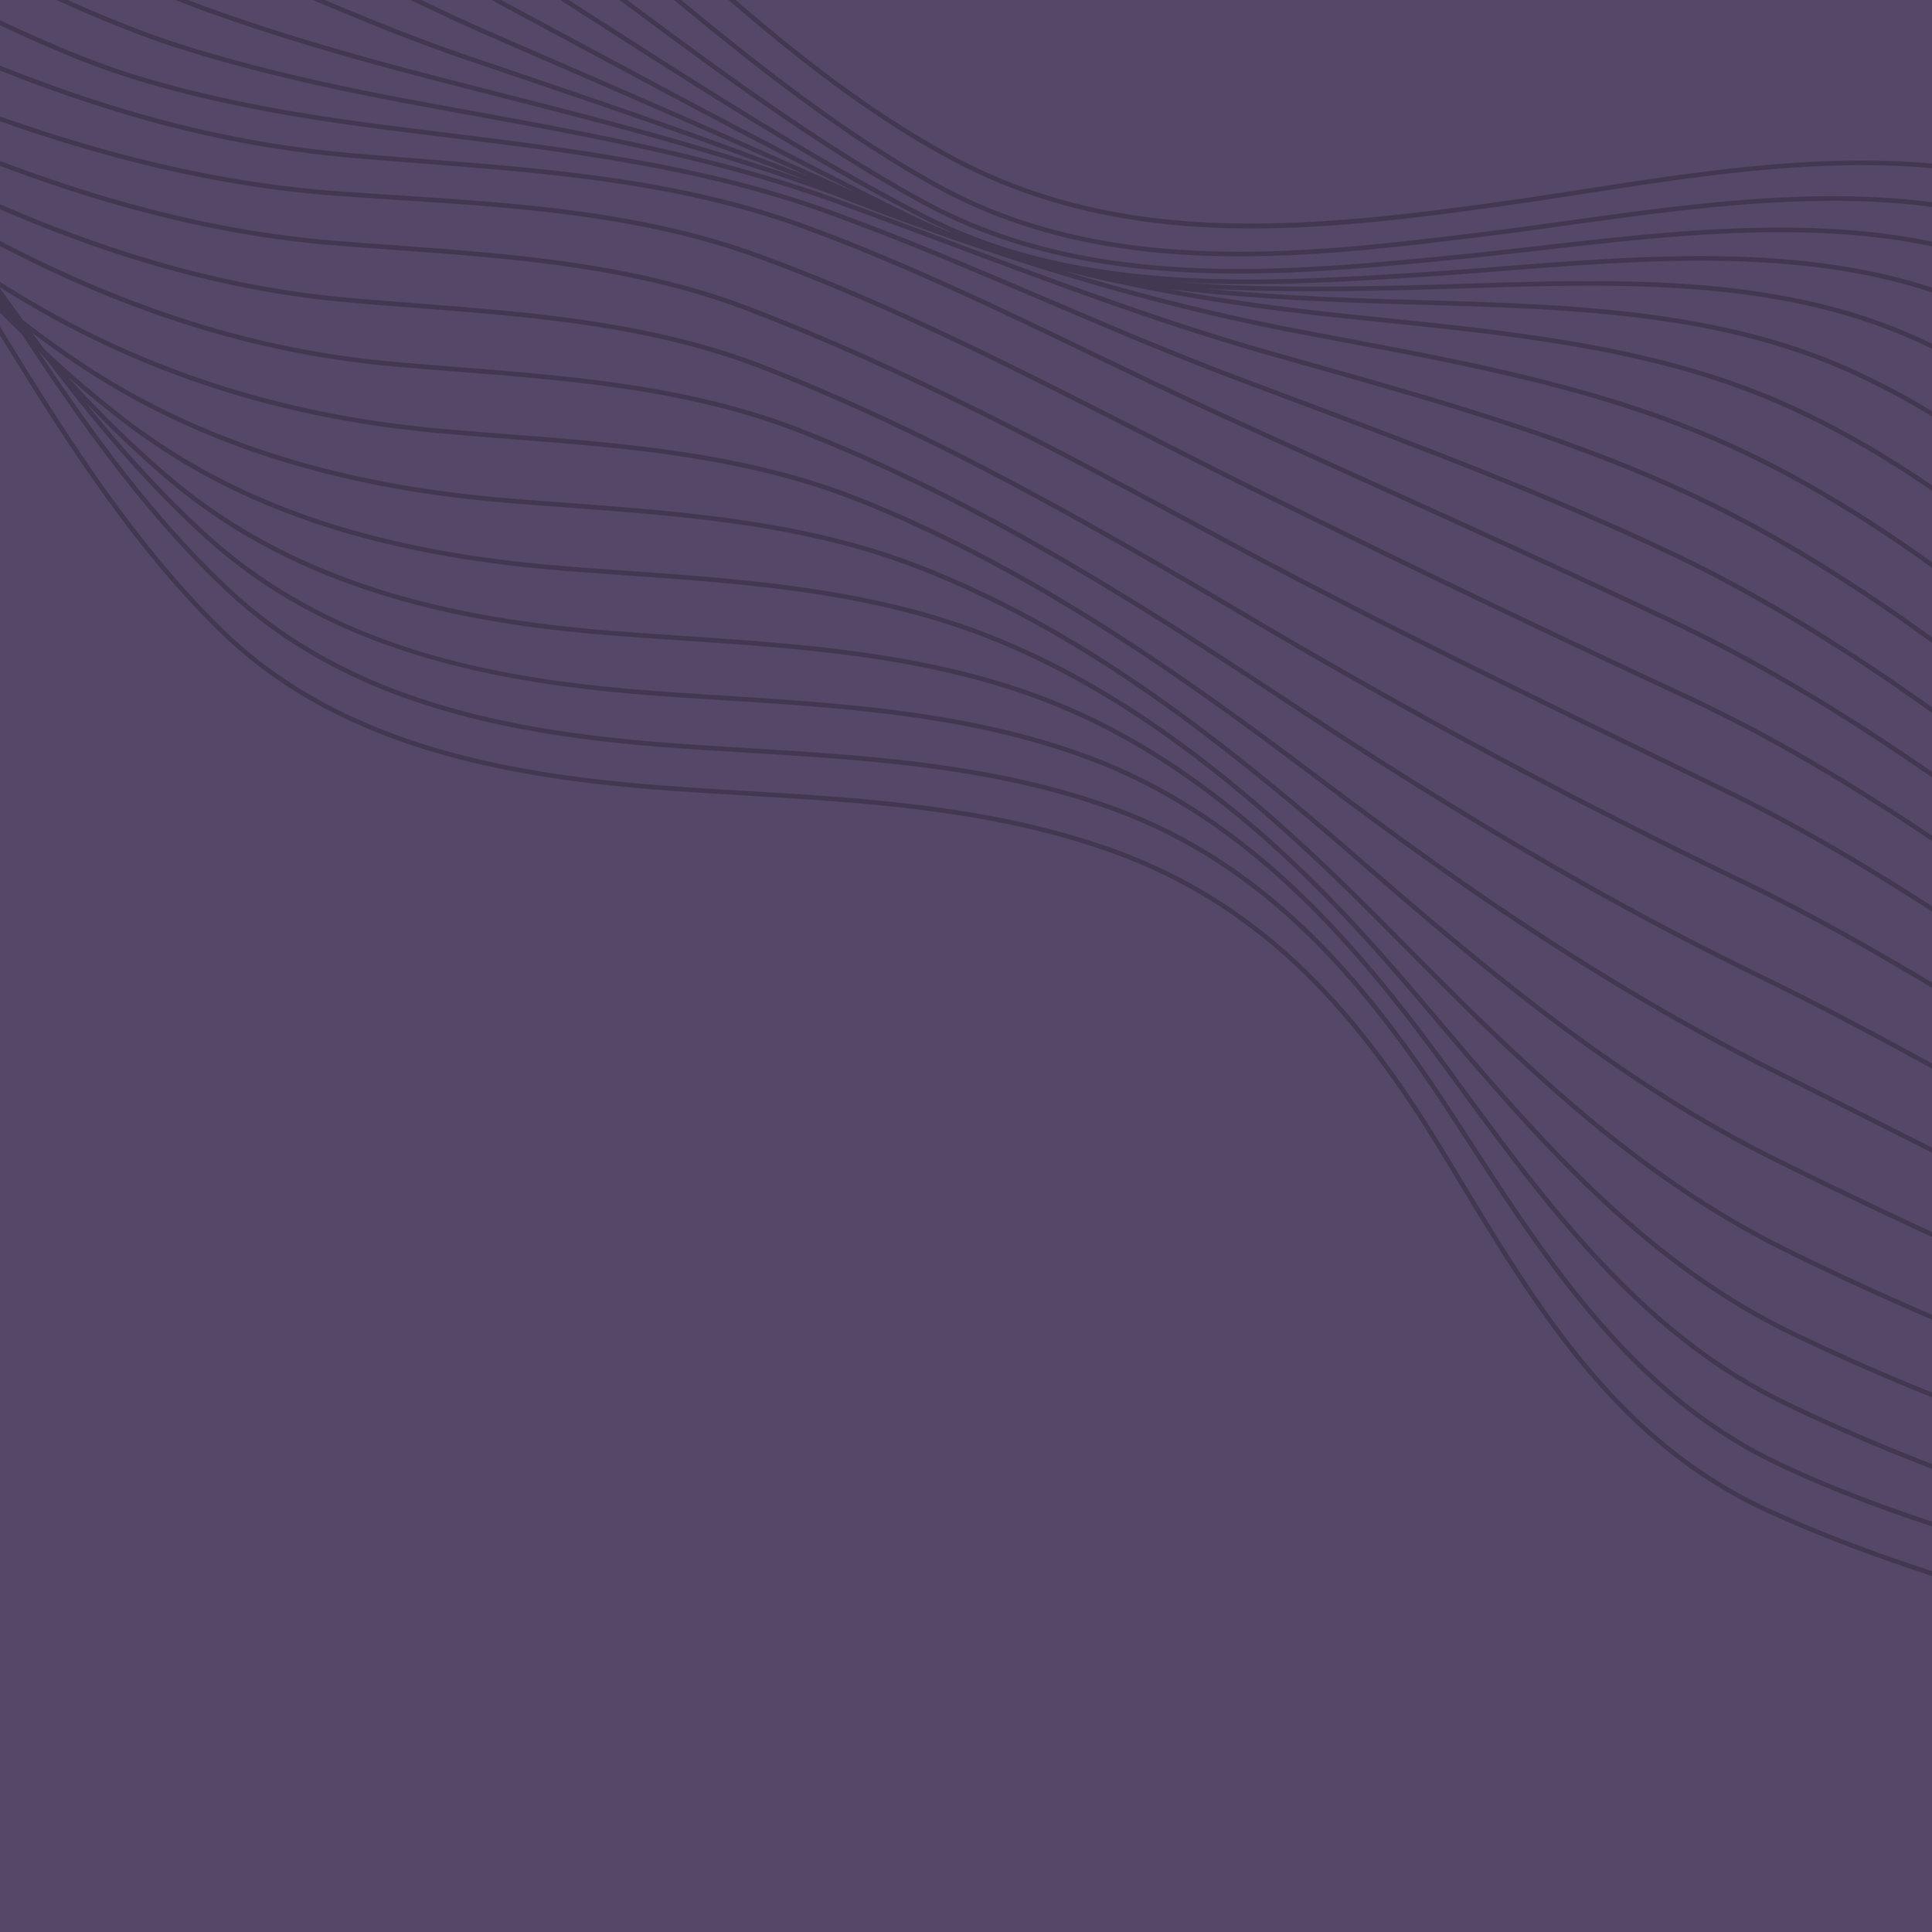 ThumbnailsForBriefingPage-V6_purplesquare.jpg